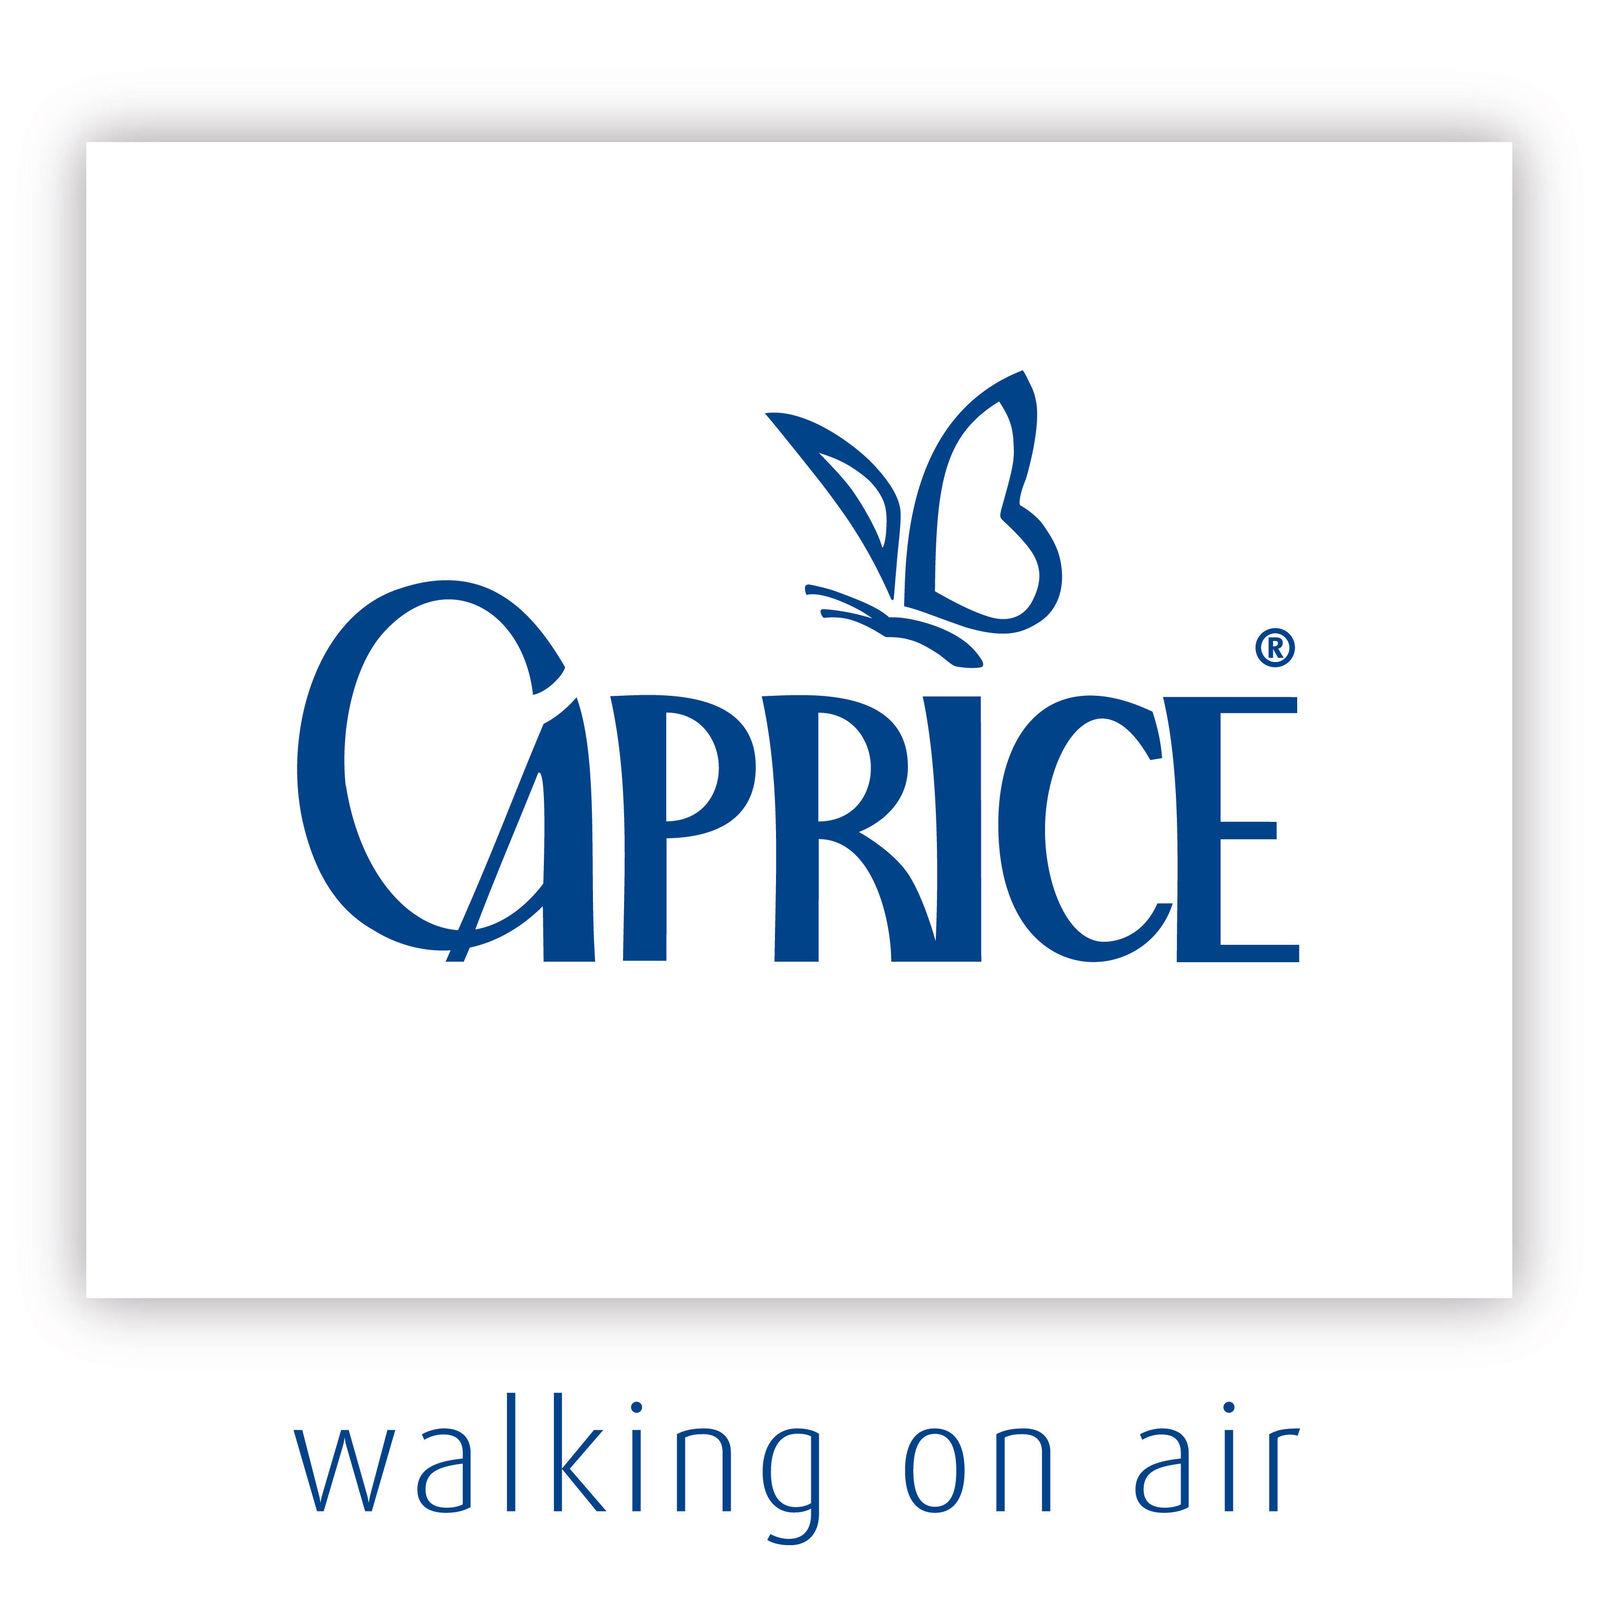 CAPRICE (Image 1)